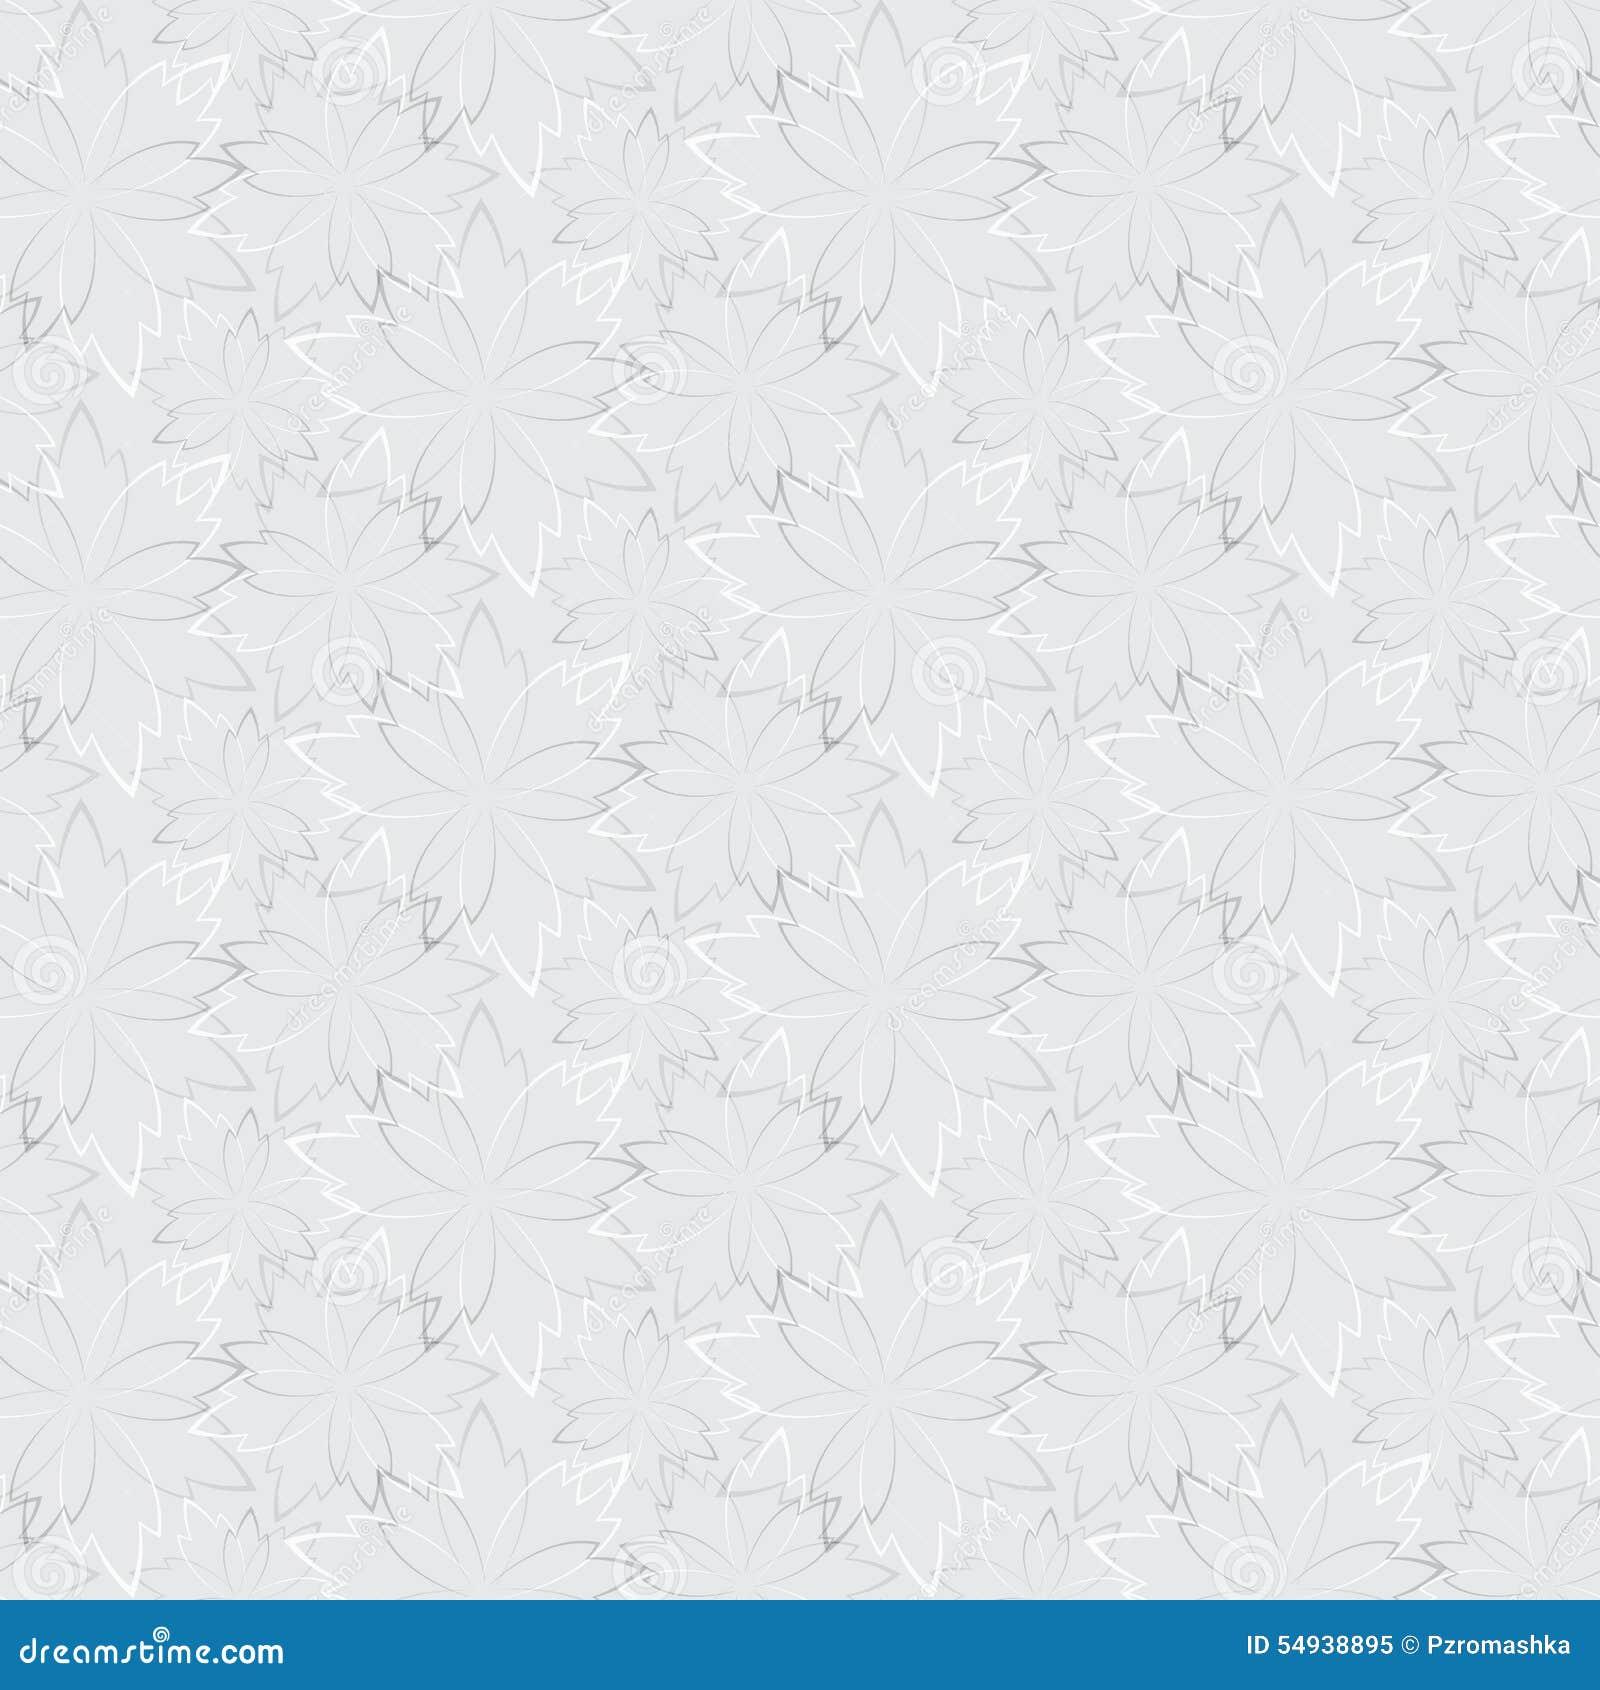 Graue nahtlose tapete mit blumenmuster vektor abbildung for Graue tapete